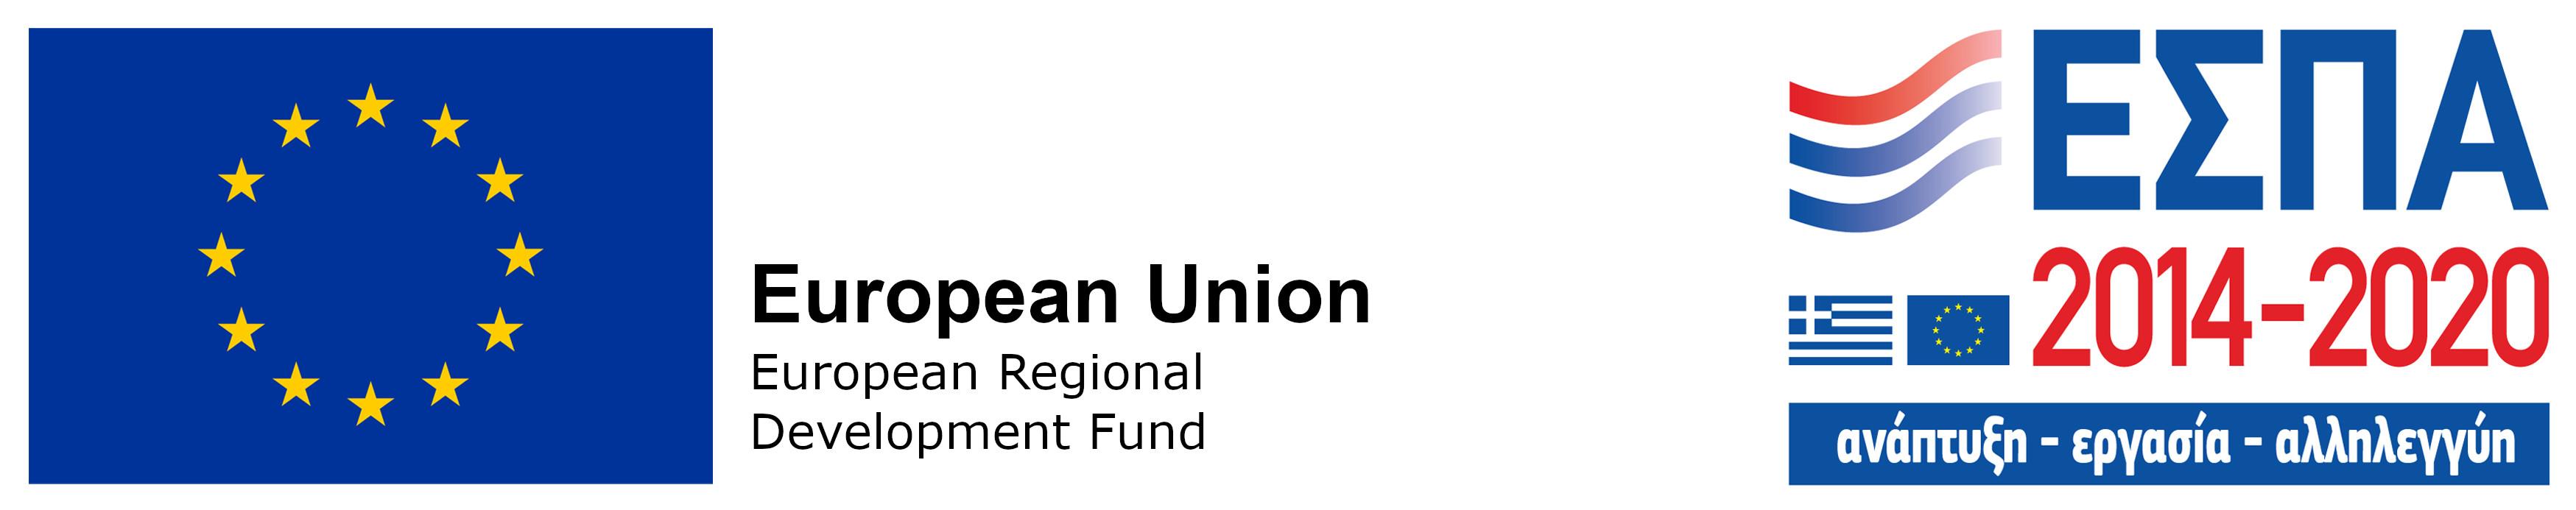 ESPA funding